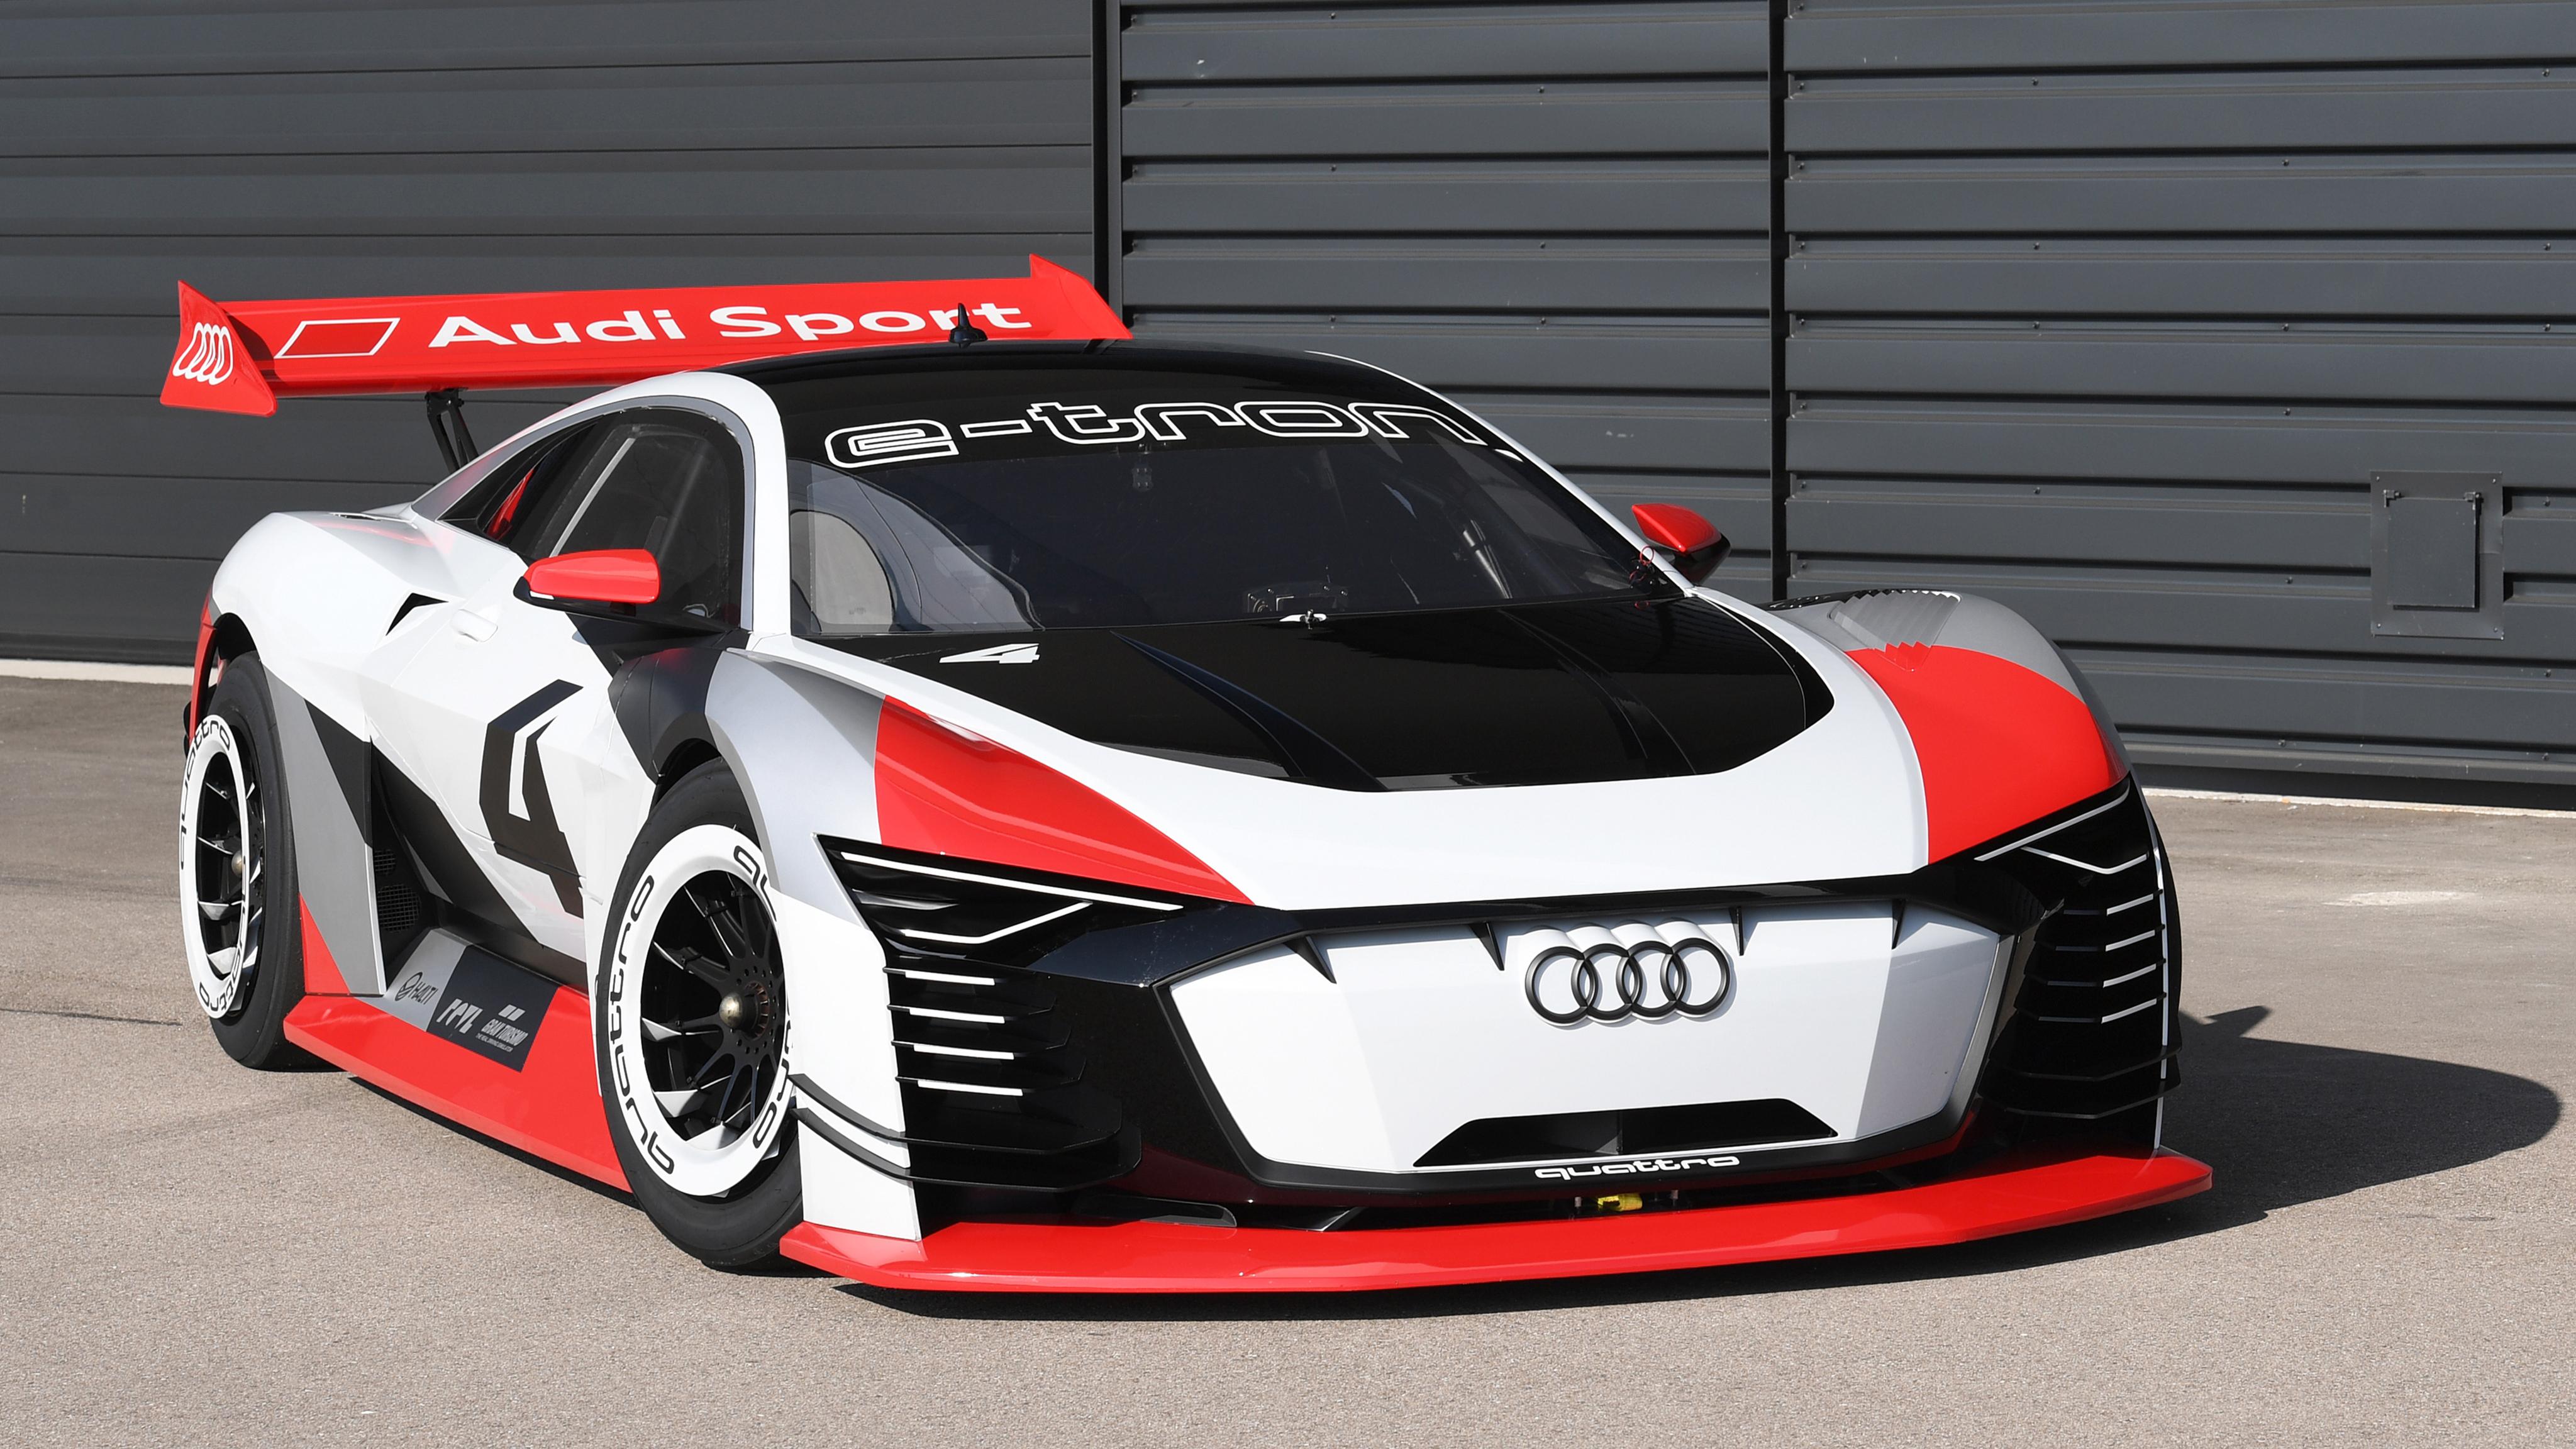 2018 Audi e tron Vision Gran Turismo 4K 3 Wallpaper HD Car 4096x2304